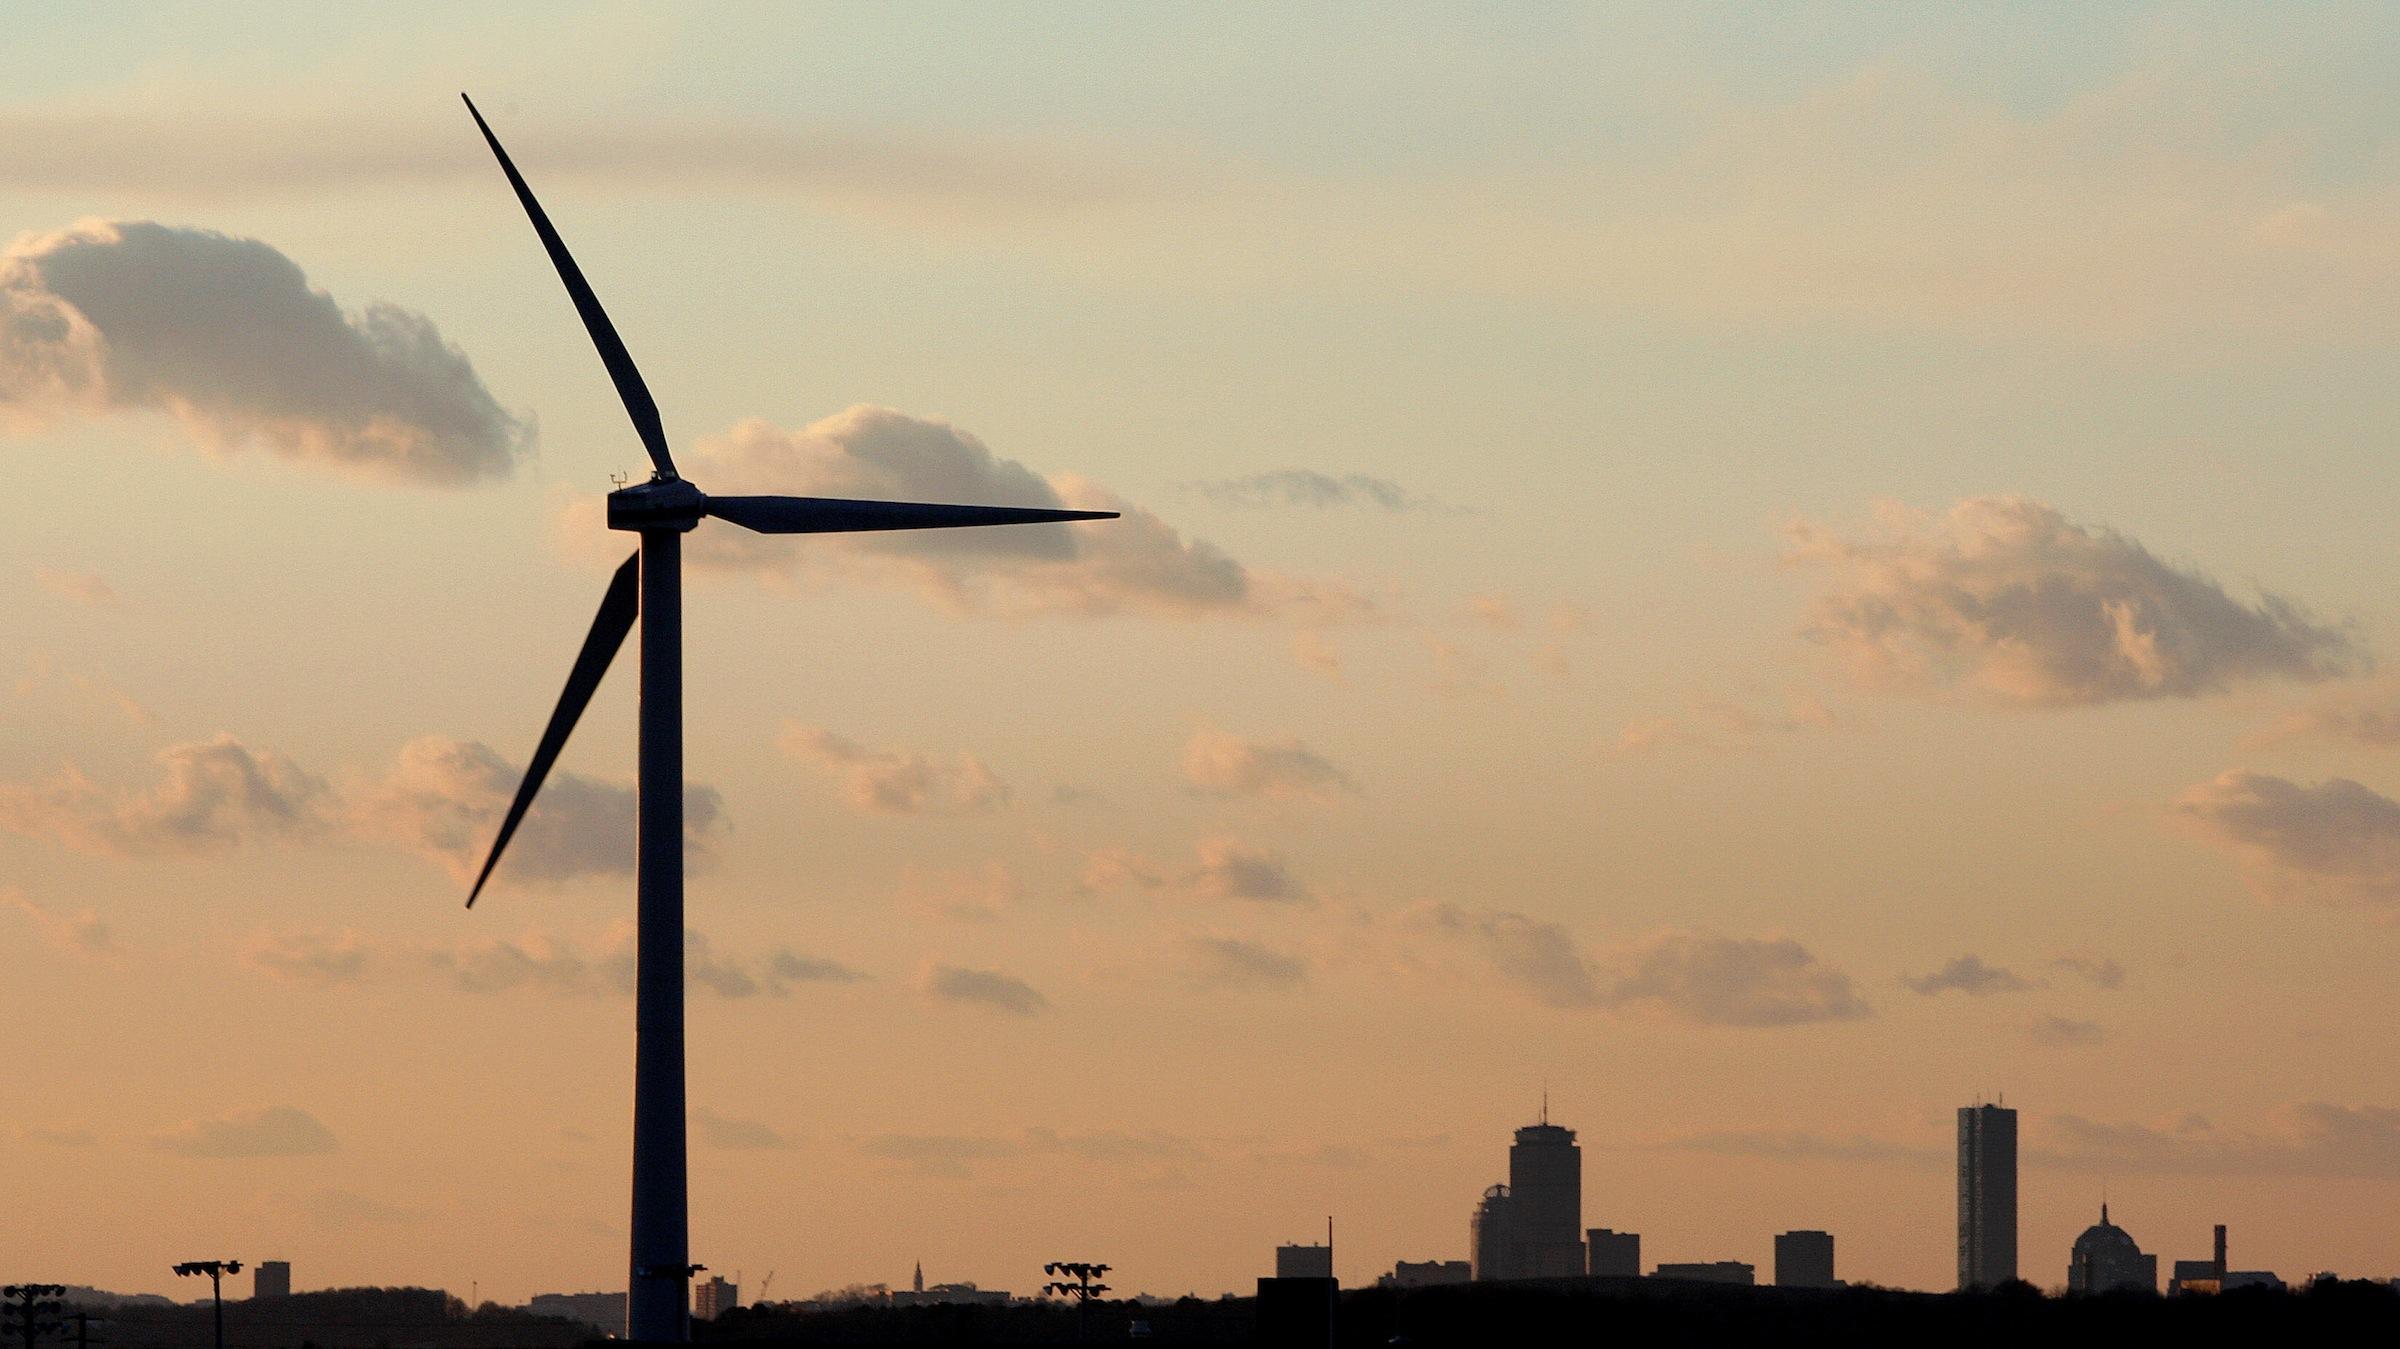 Wind turbine at sunset